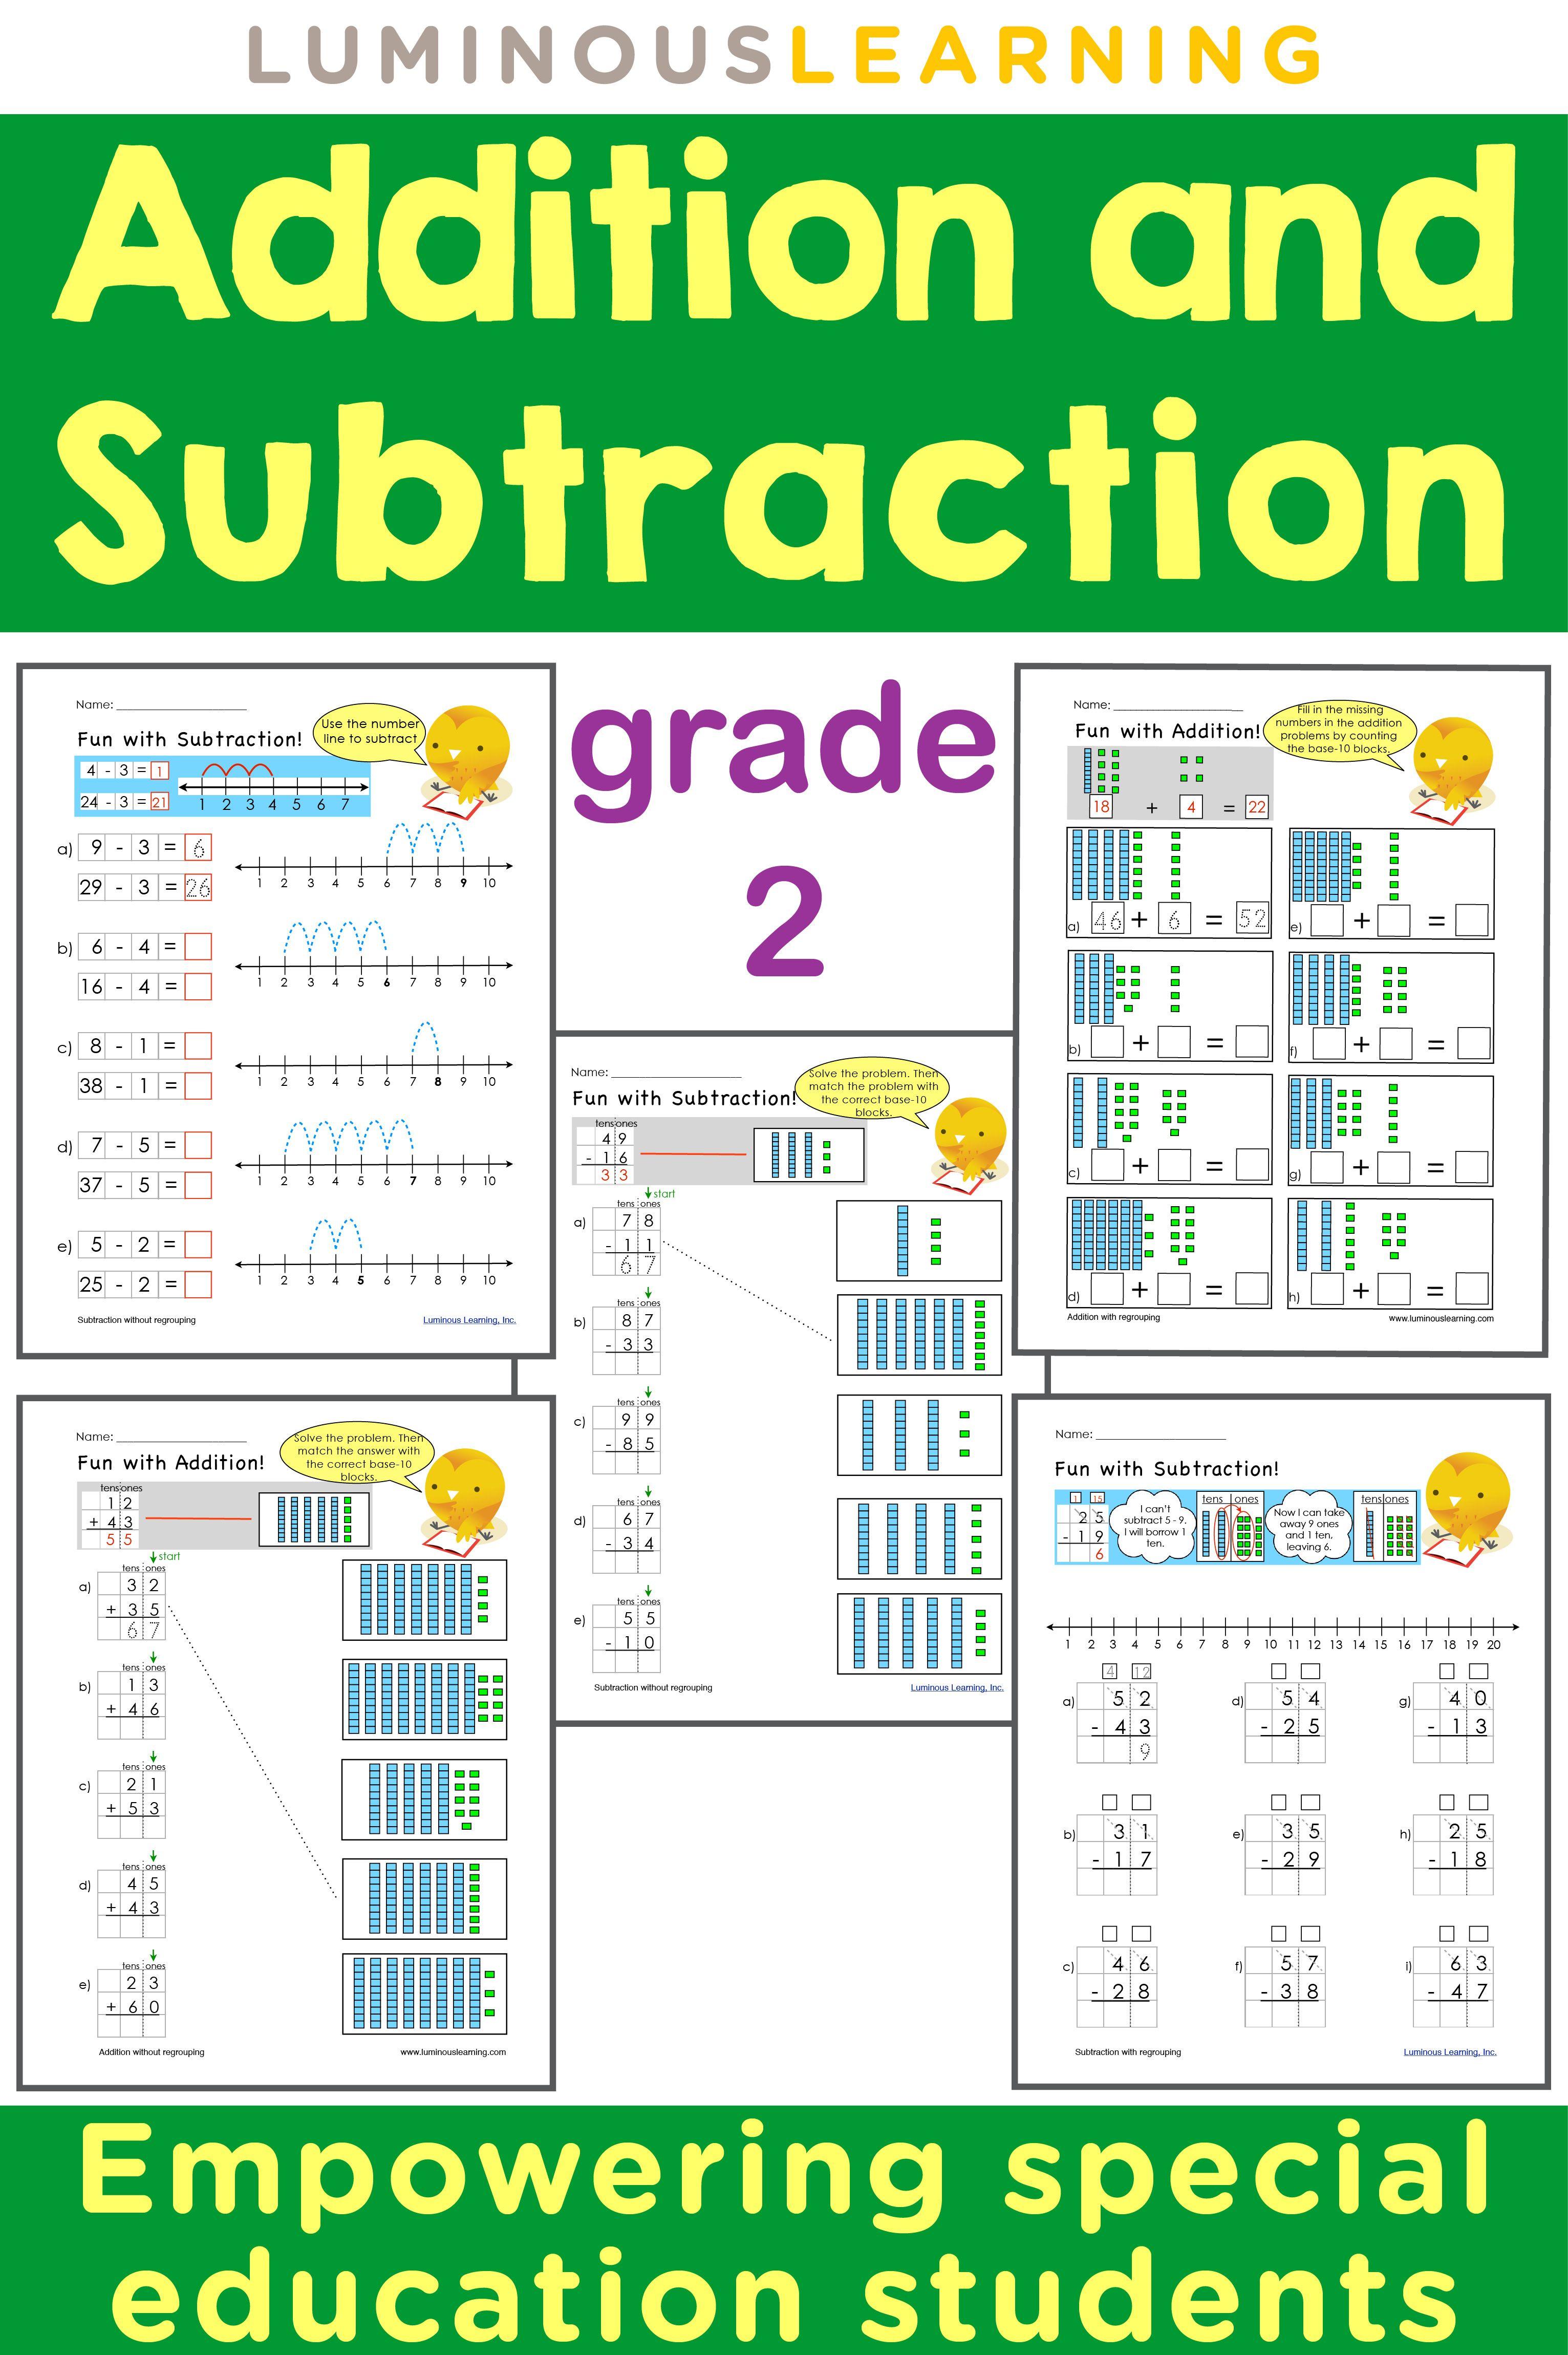 grade 2 addition and subtraction workbook making math visual bundle visual aids graph paper. Black Bedroom Furniture Sets. Home Design Ideas